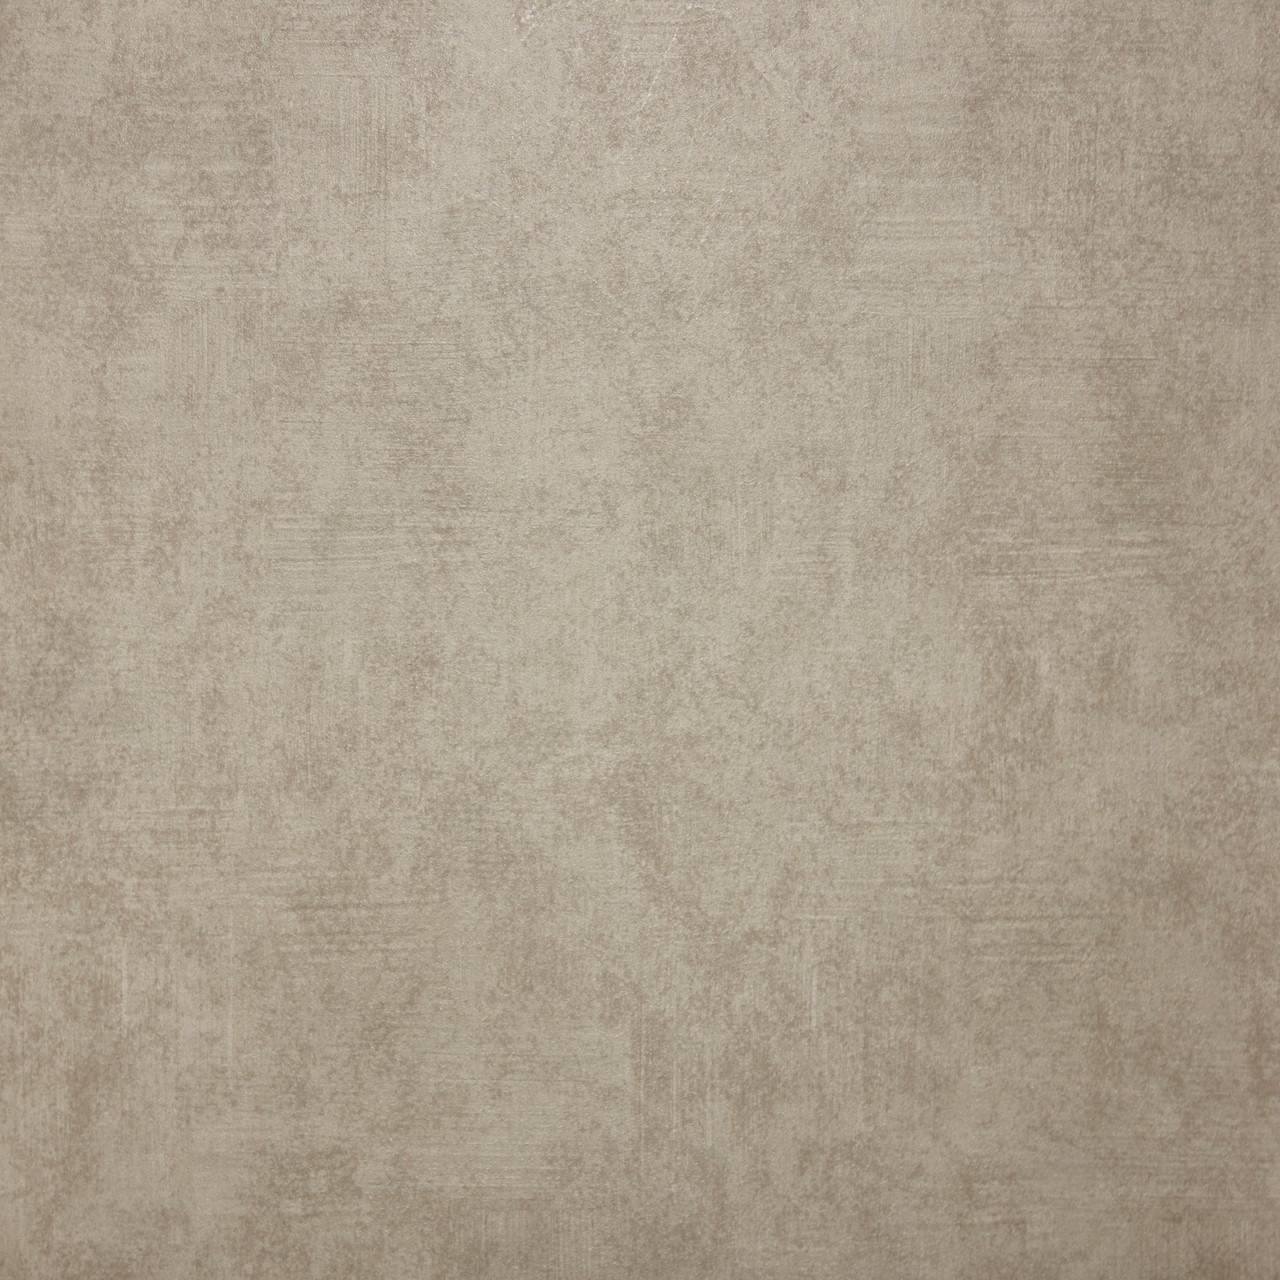 Perfect Rv Interior Wall Panels Vaudevillenegrocom 1Nov16 074415